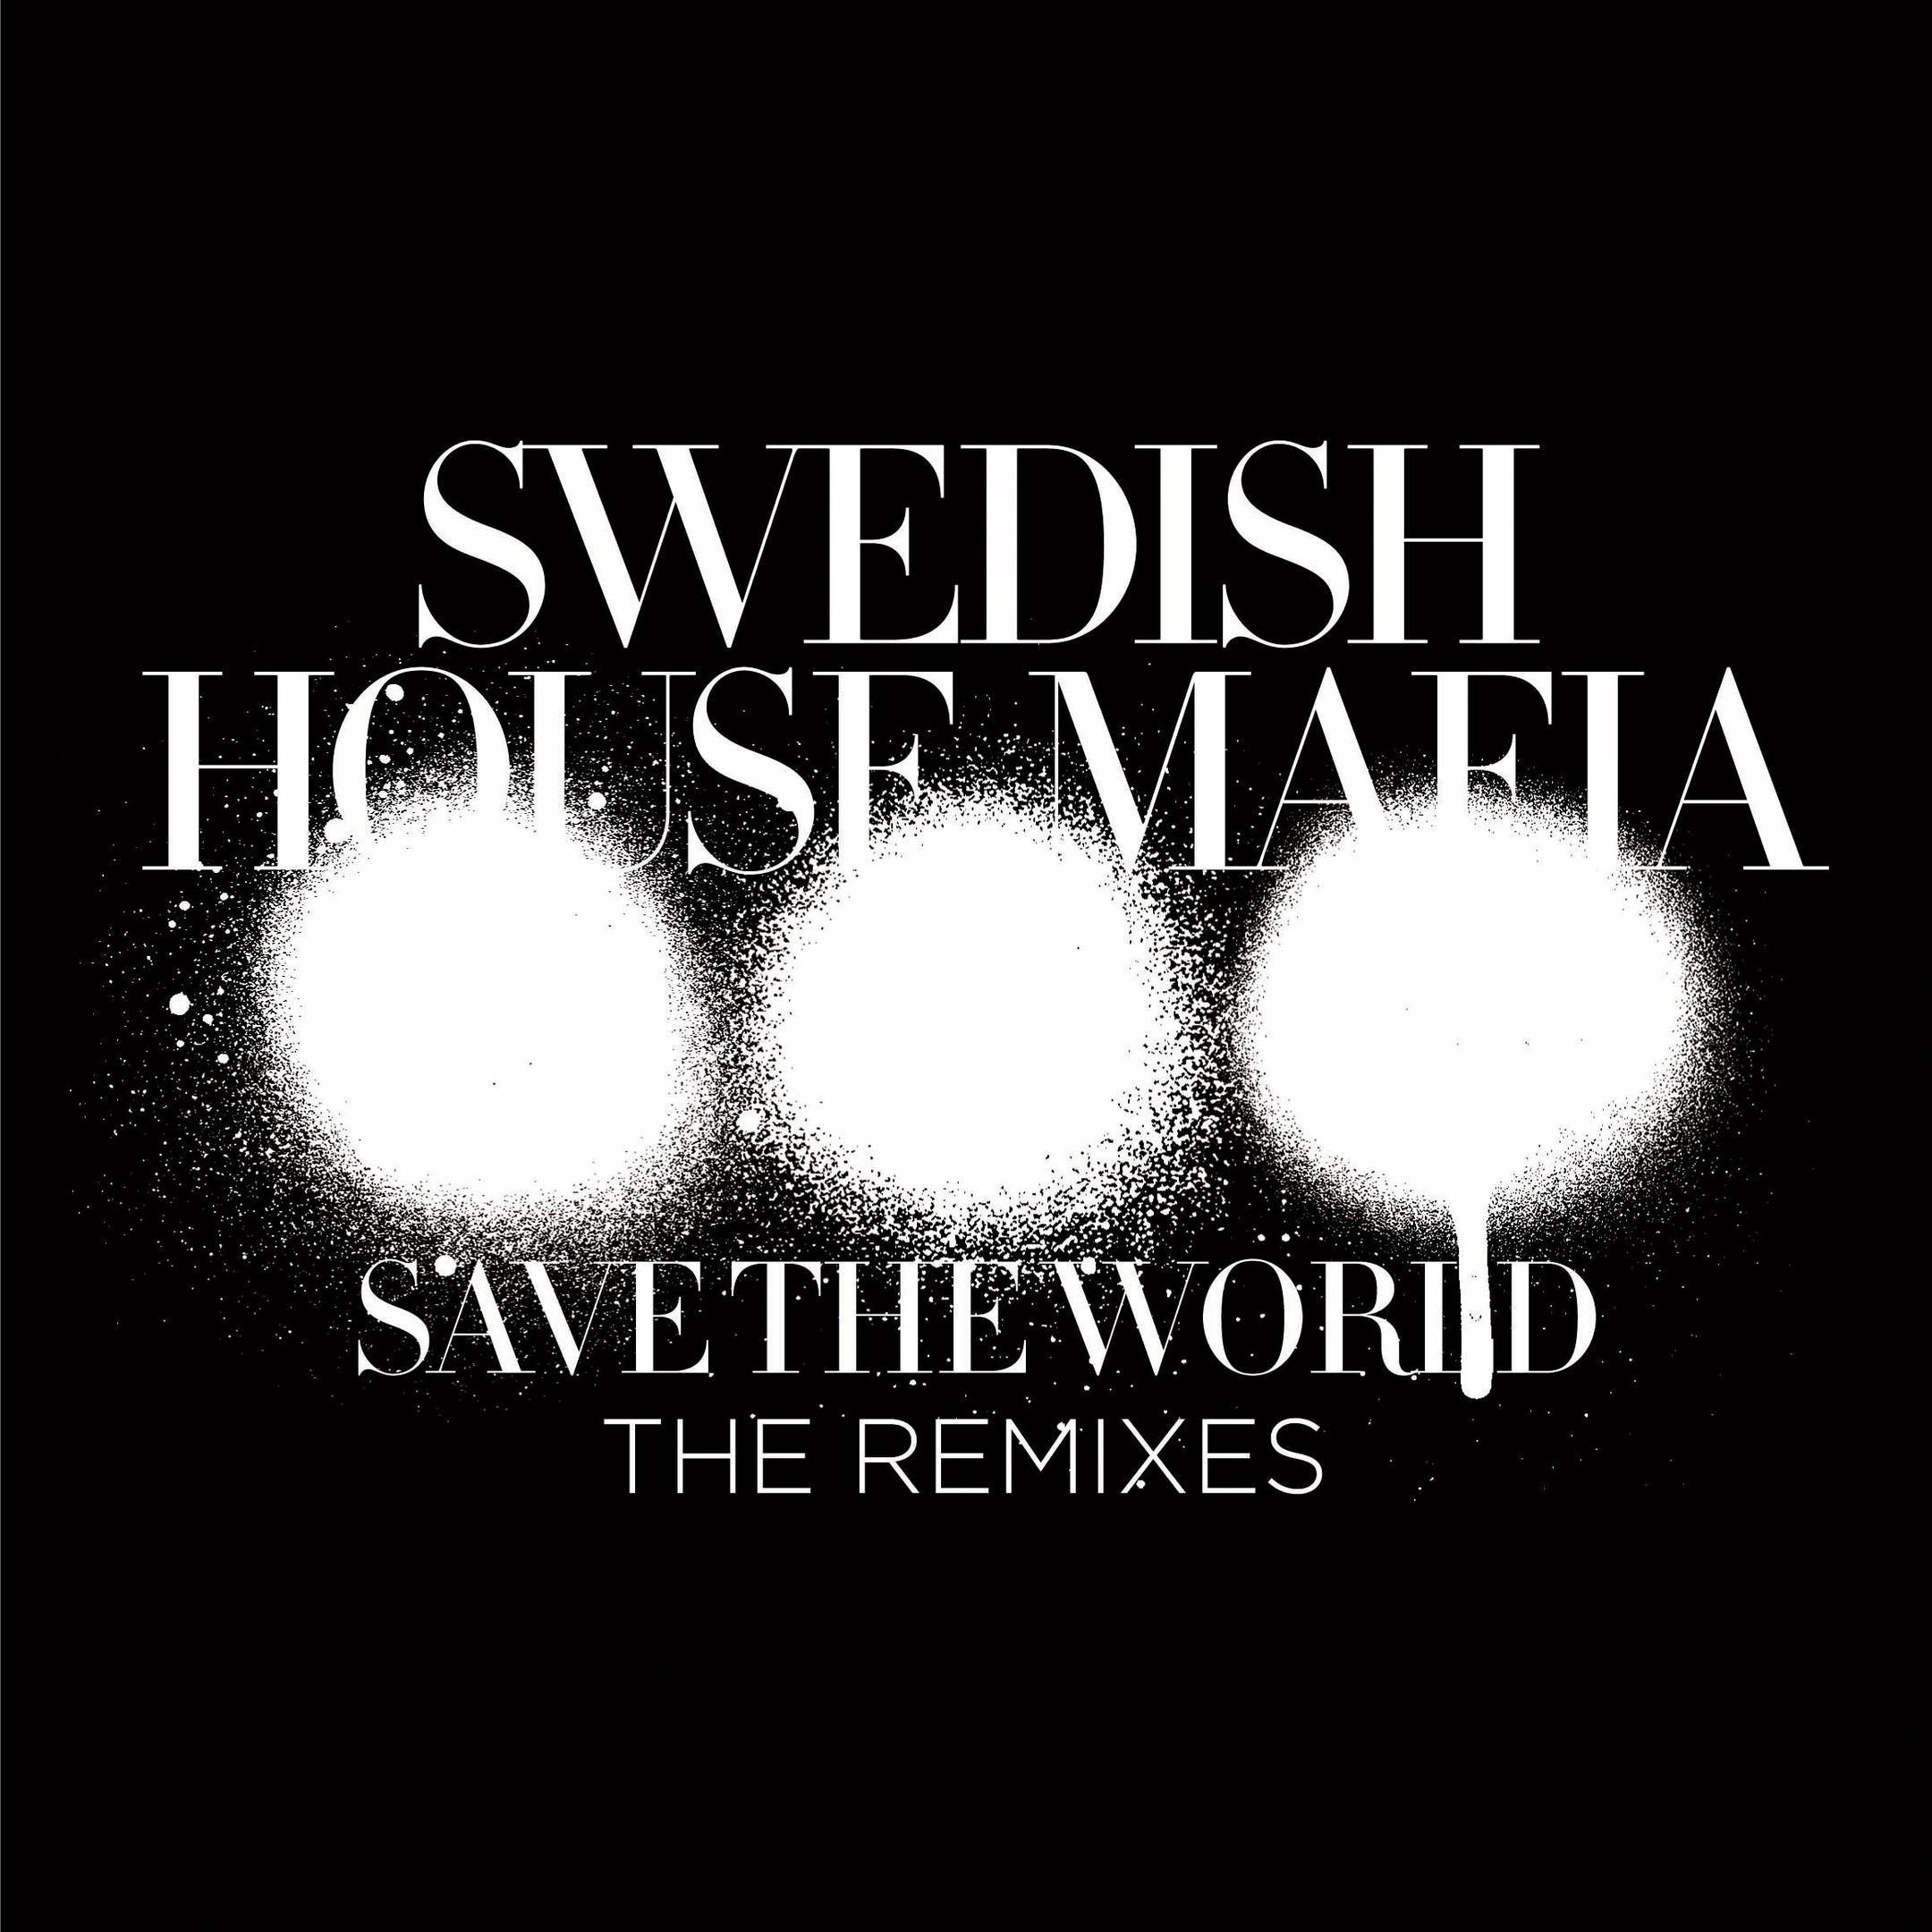 Swedish House Mafia album Save The World (The Remixes)